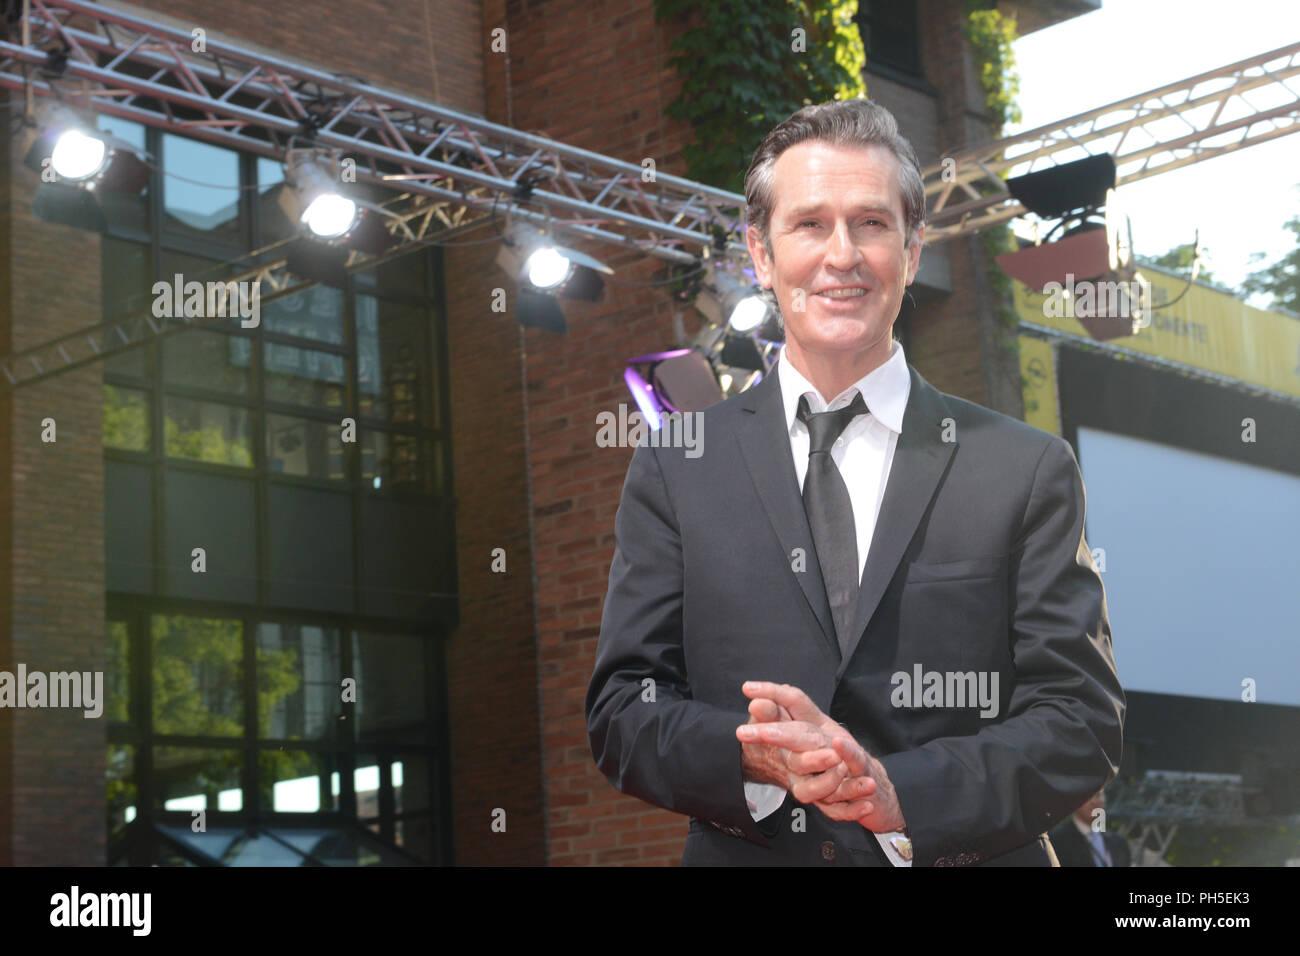 Actor Rupert Everett arrives at Filmfest München 2015 - Stock Image